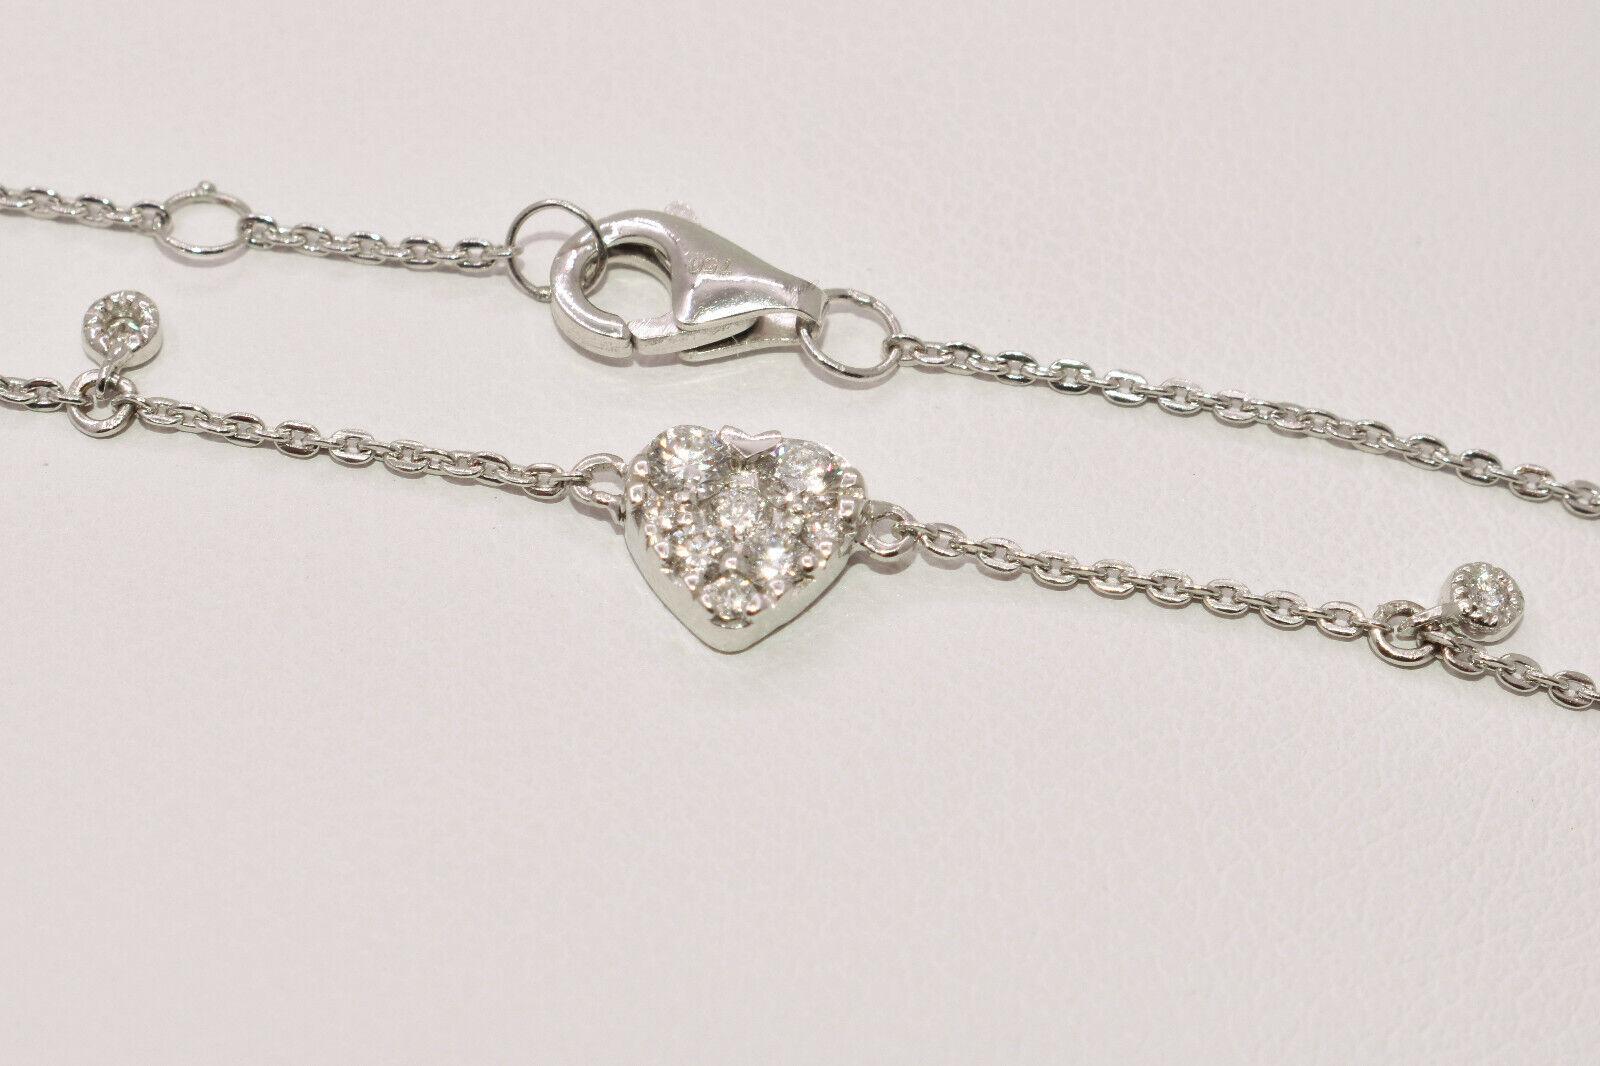 Bracelet with Heart Shape Diamond Cluster in 18K White Gold - Adjustable